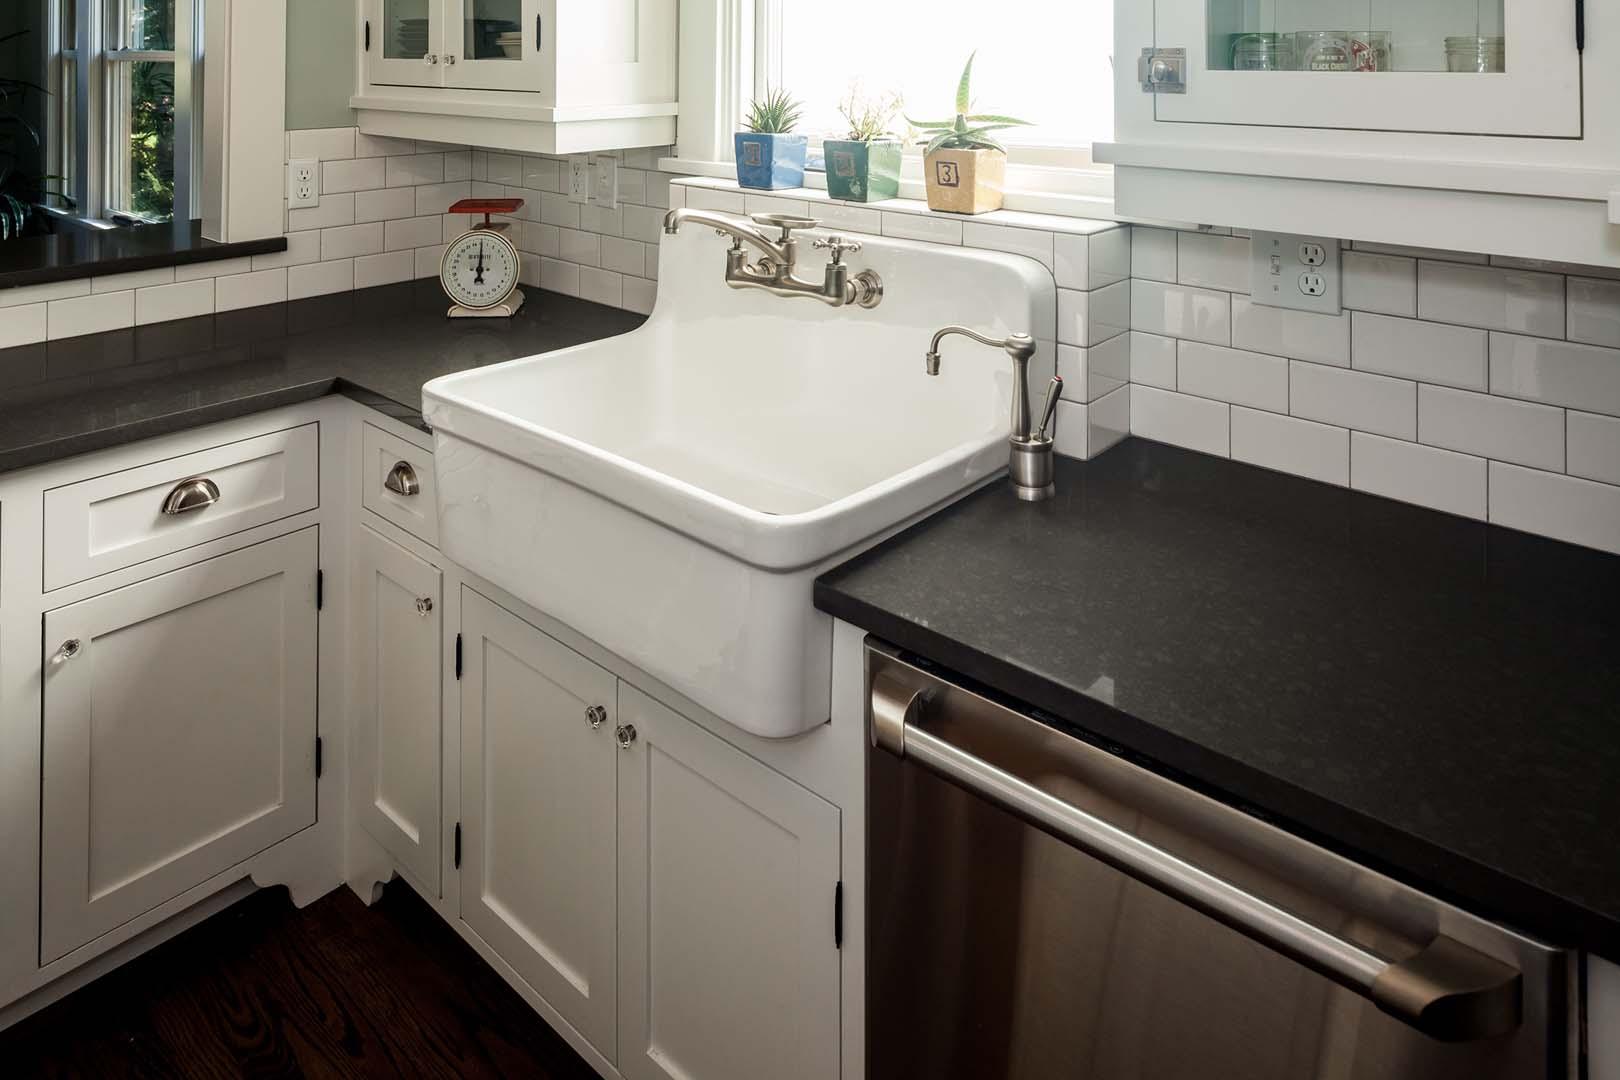 Kitchen ne portland or natural stone designs for Caesarstone portland